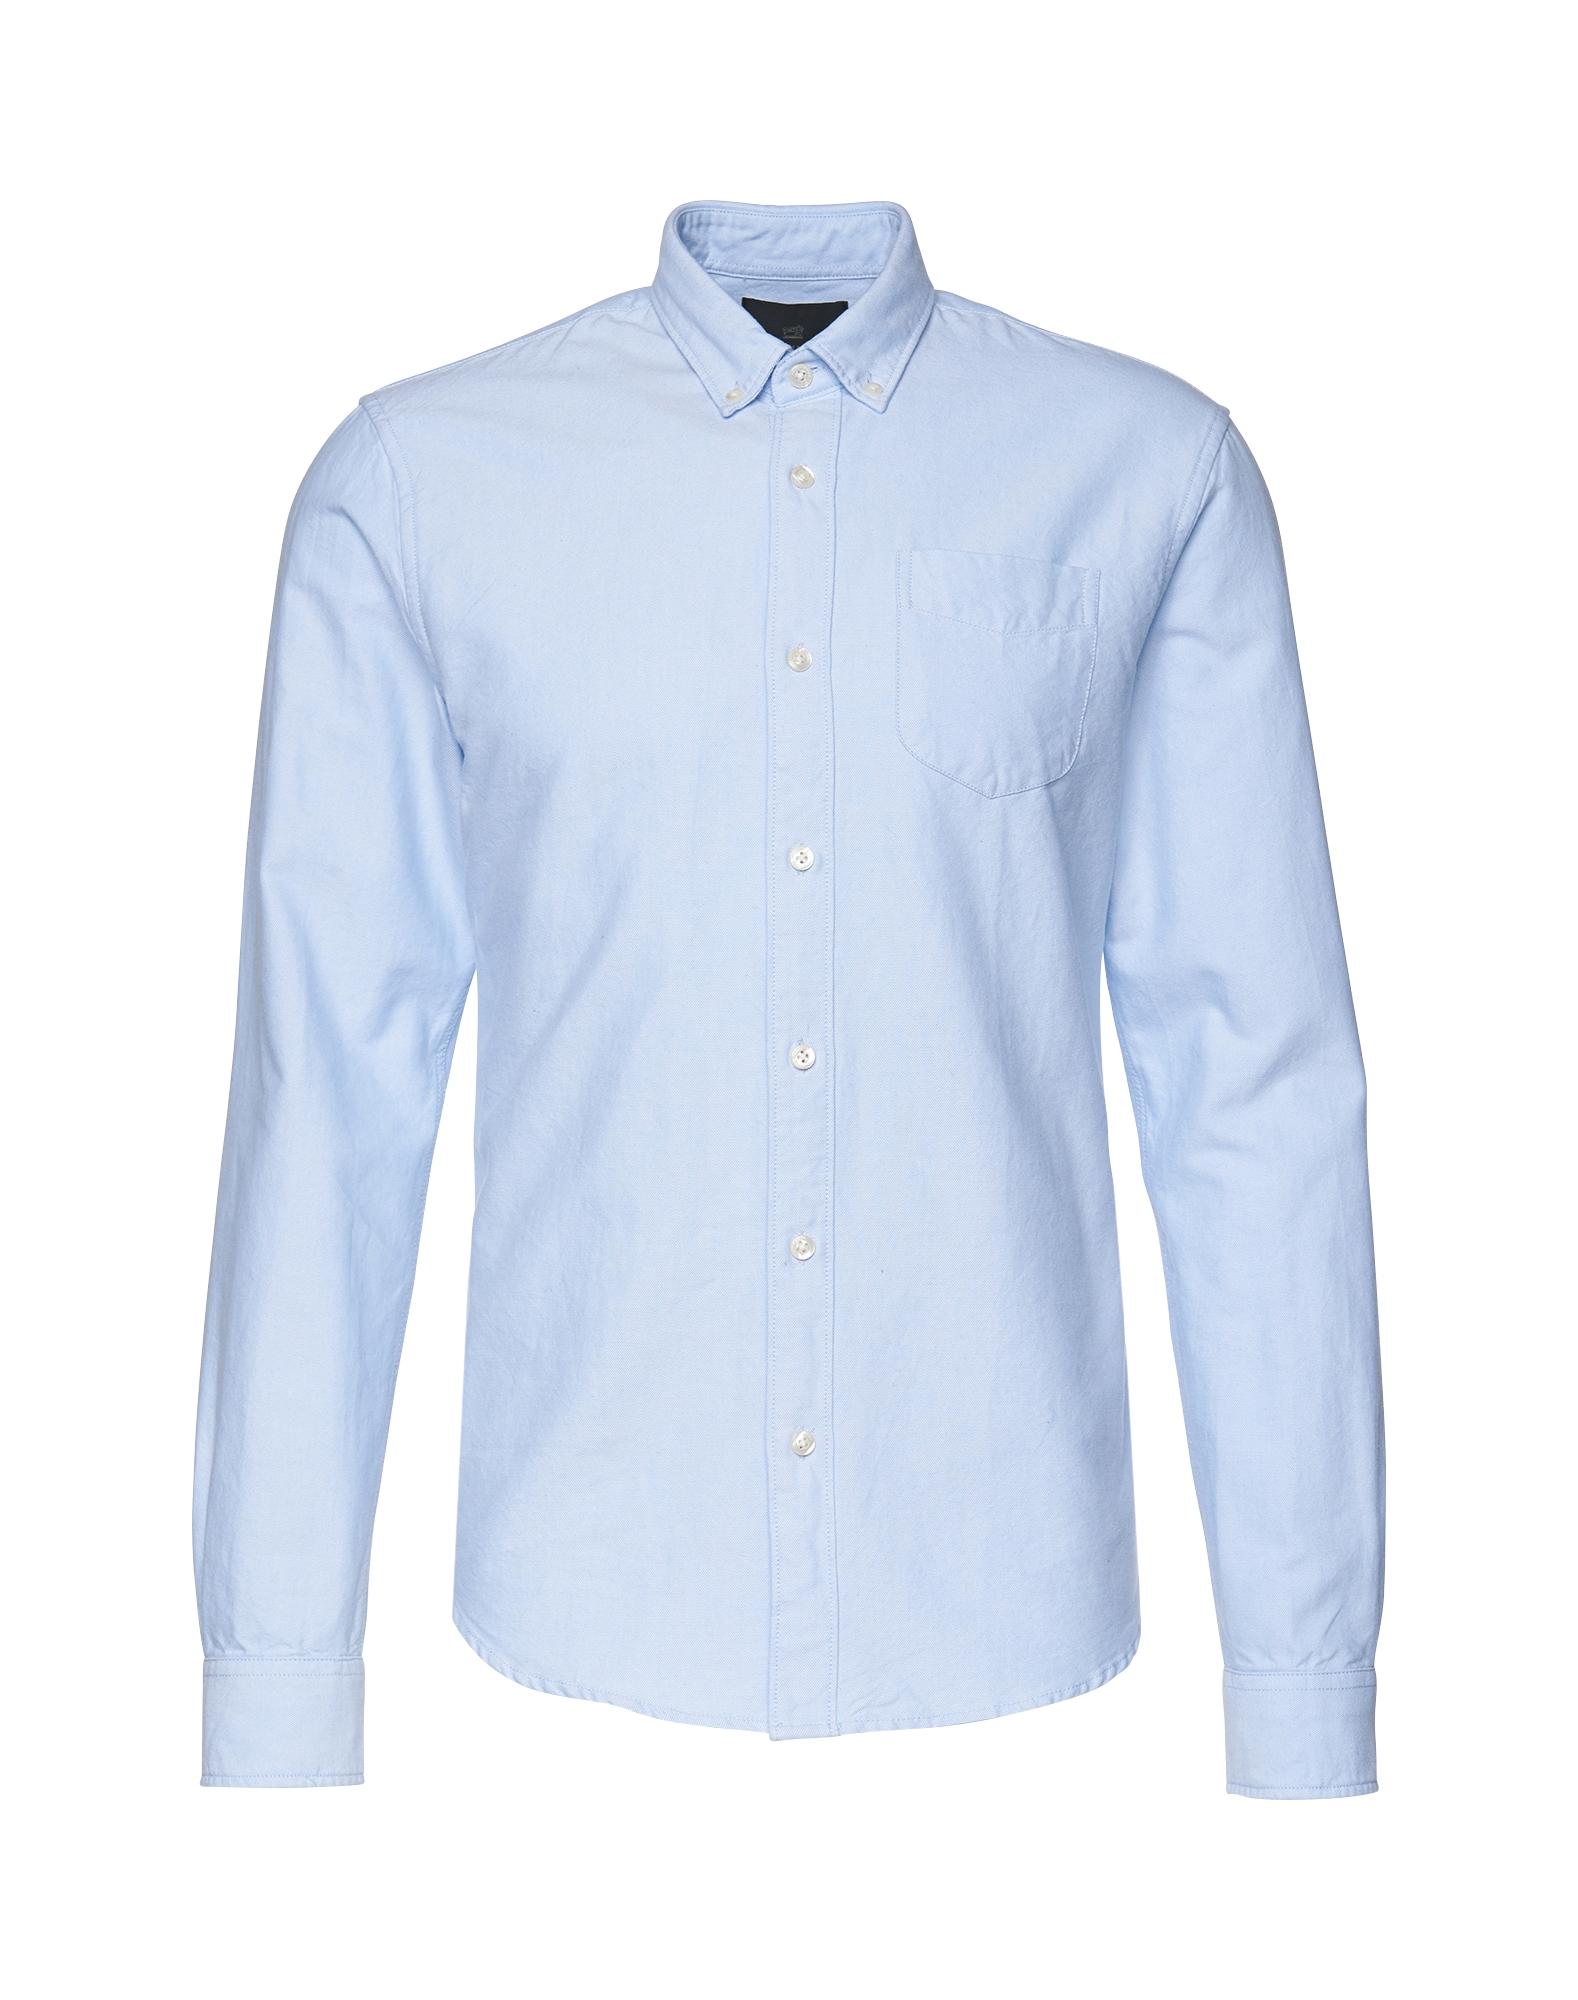 SCOTCH  and  SODA Heren Zakelijk overhemd Classic Oxford Shirt lichtblauw